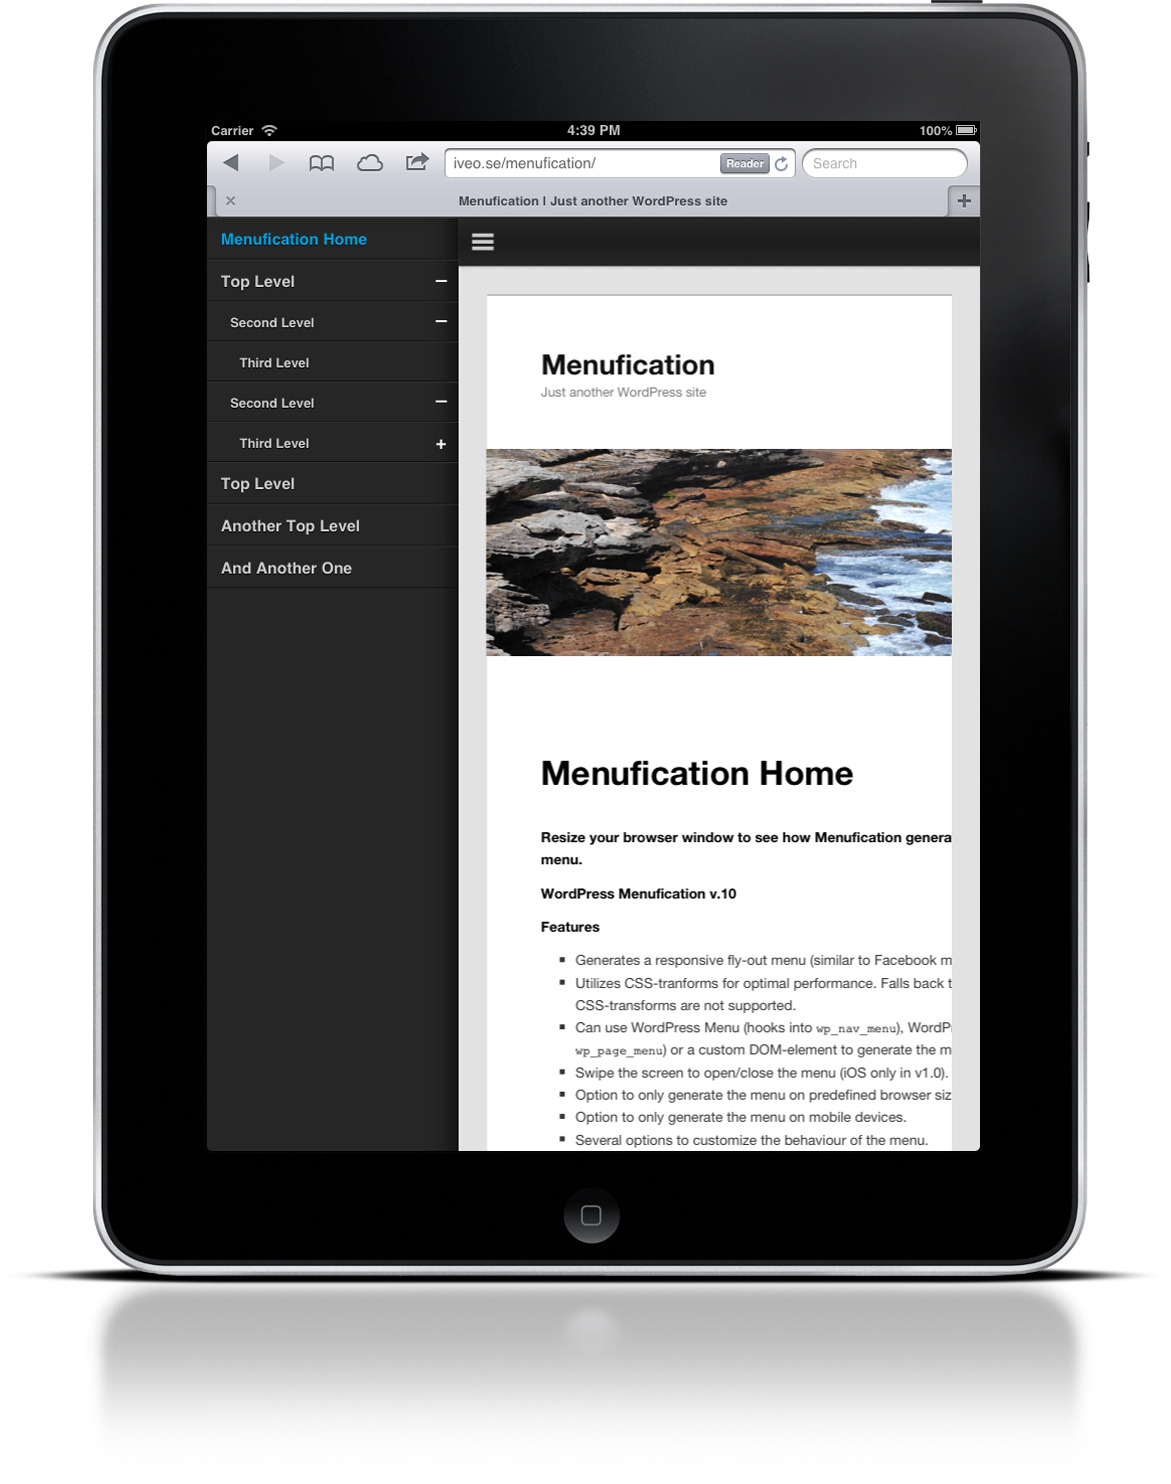 Wordpress Menufication